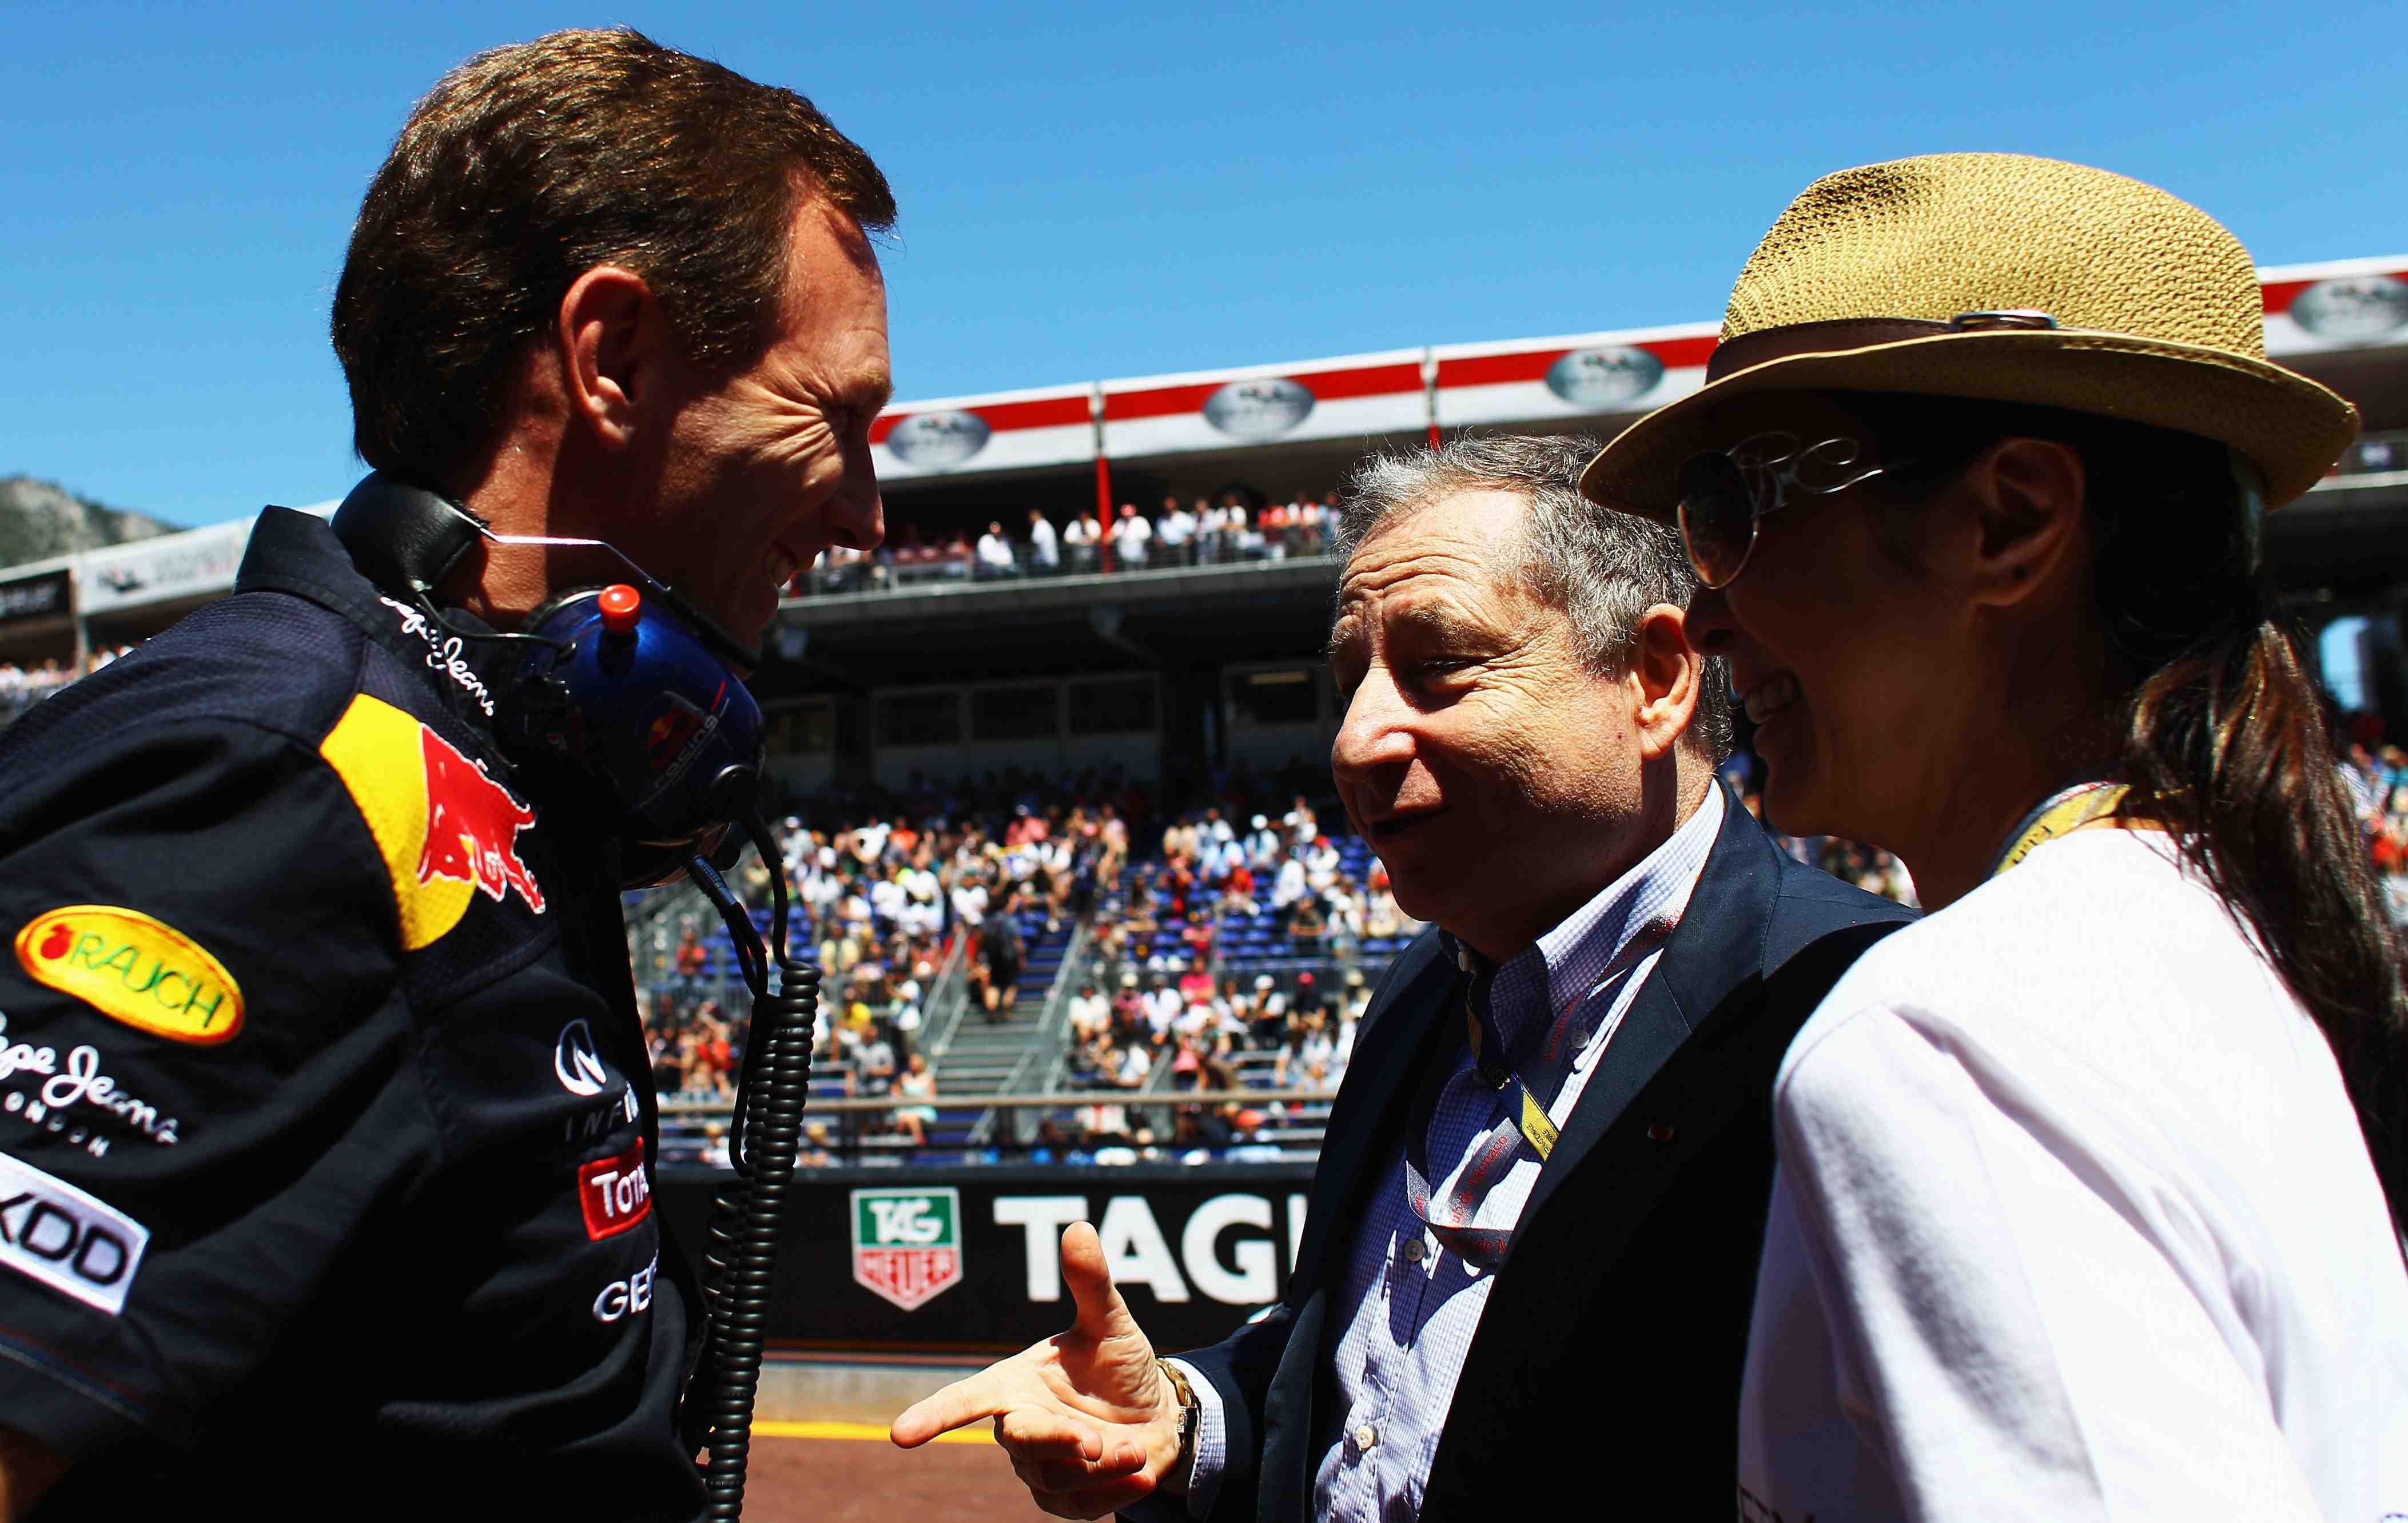 Todt keeps 2012 F1 calendar at 20 races